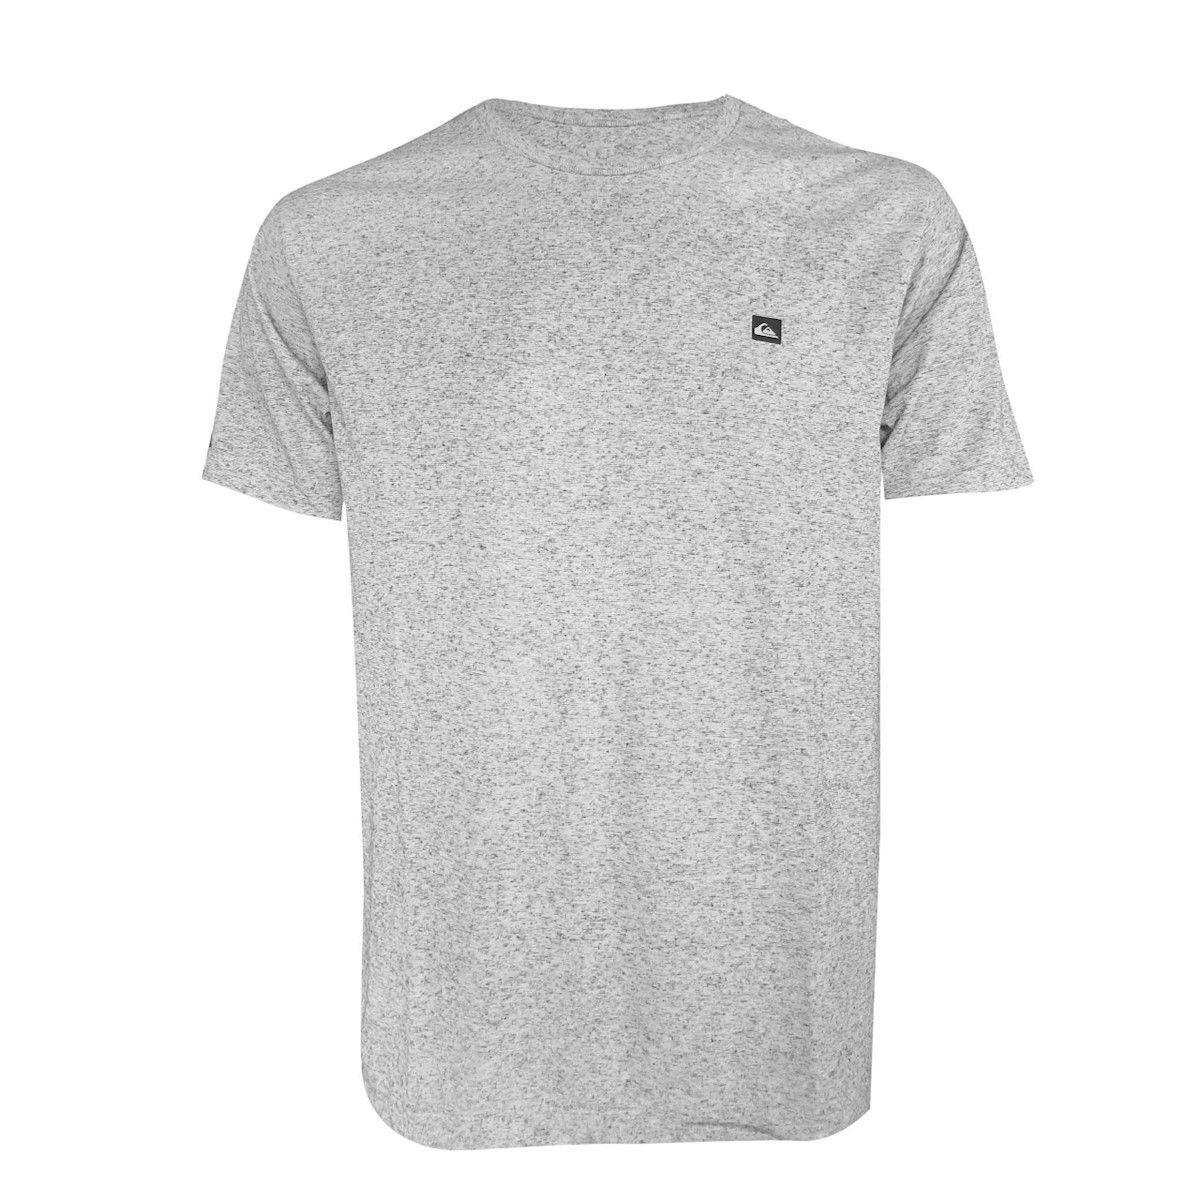 Camiseta Quiksilver Supertransfer Grey Heat